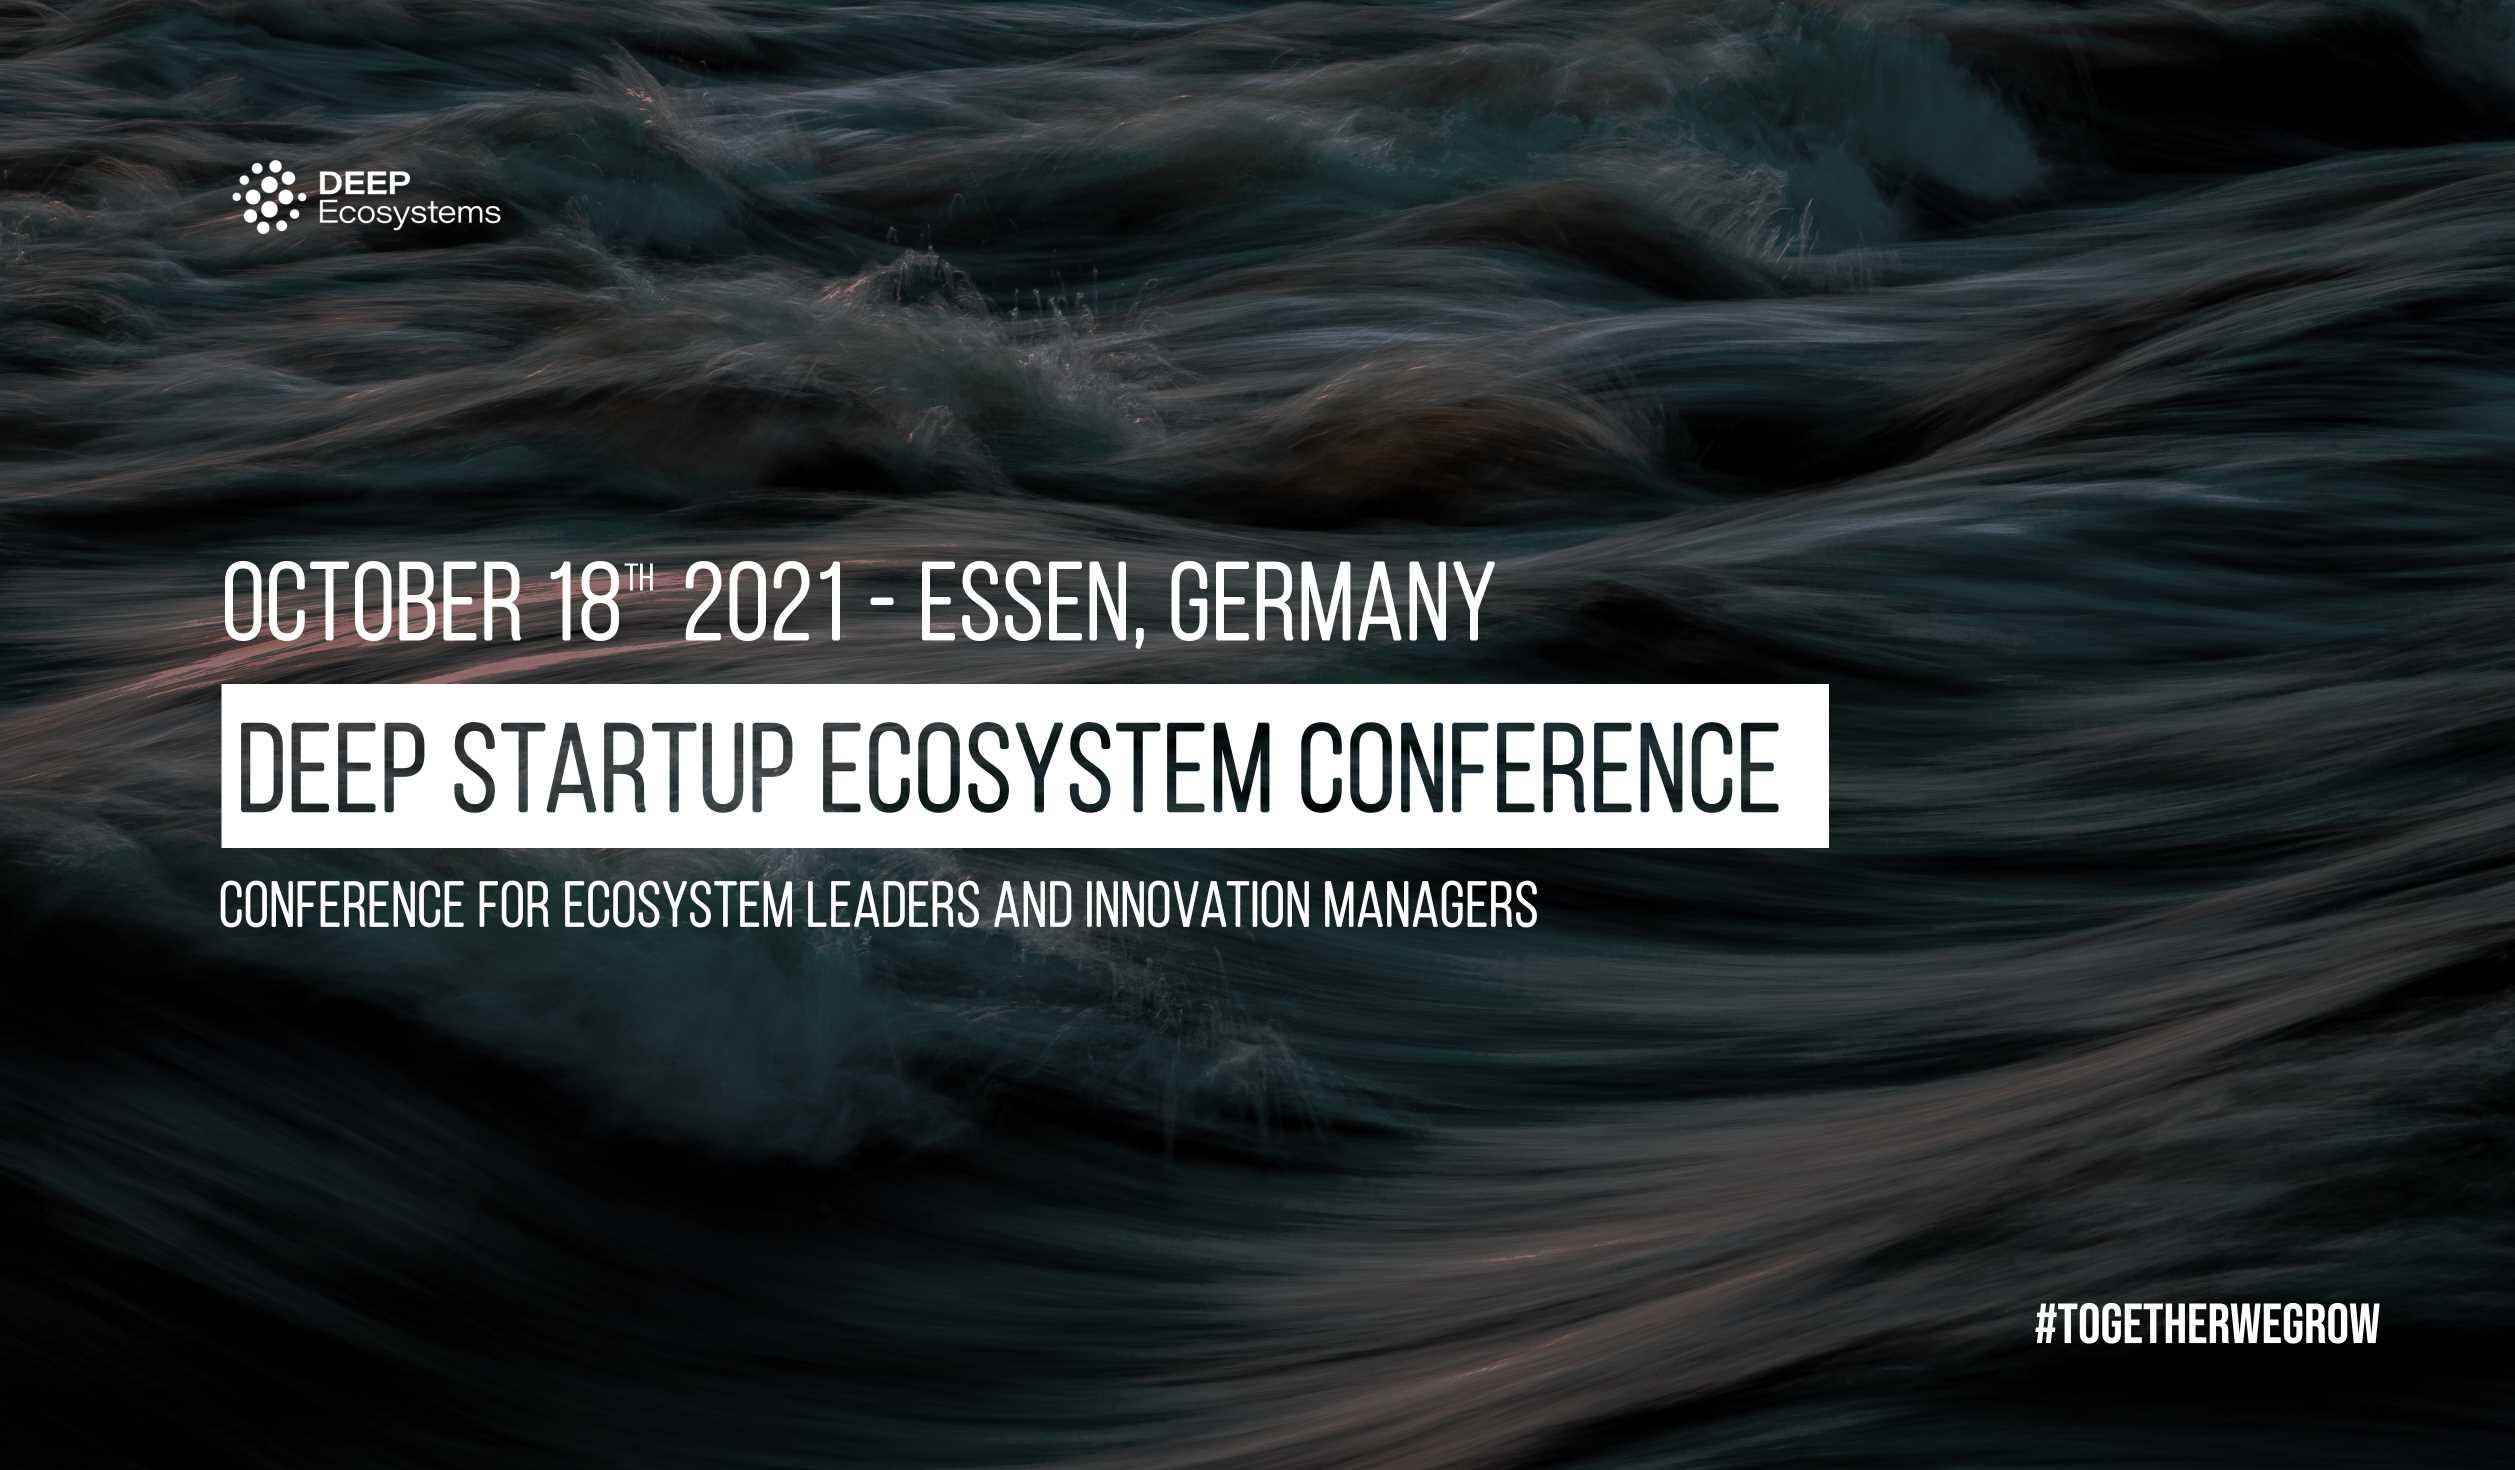 DEEP Startup Ecosystem